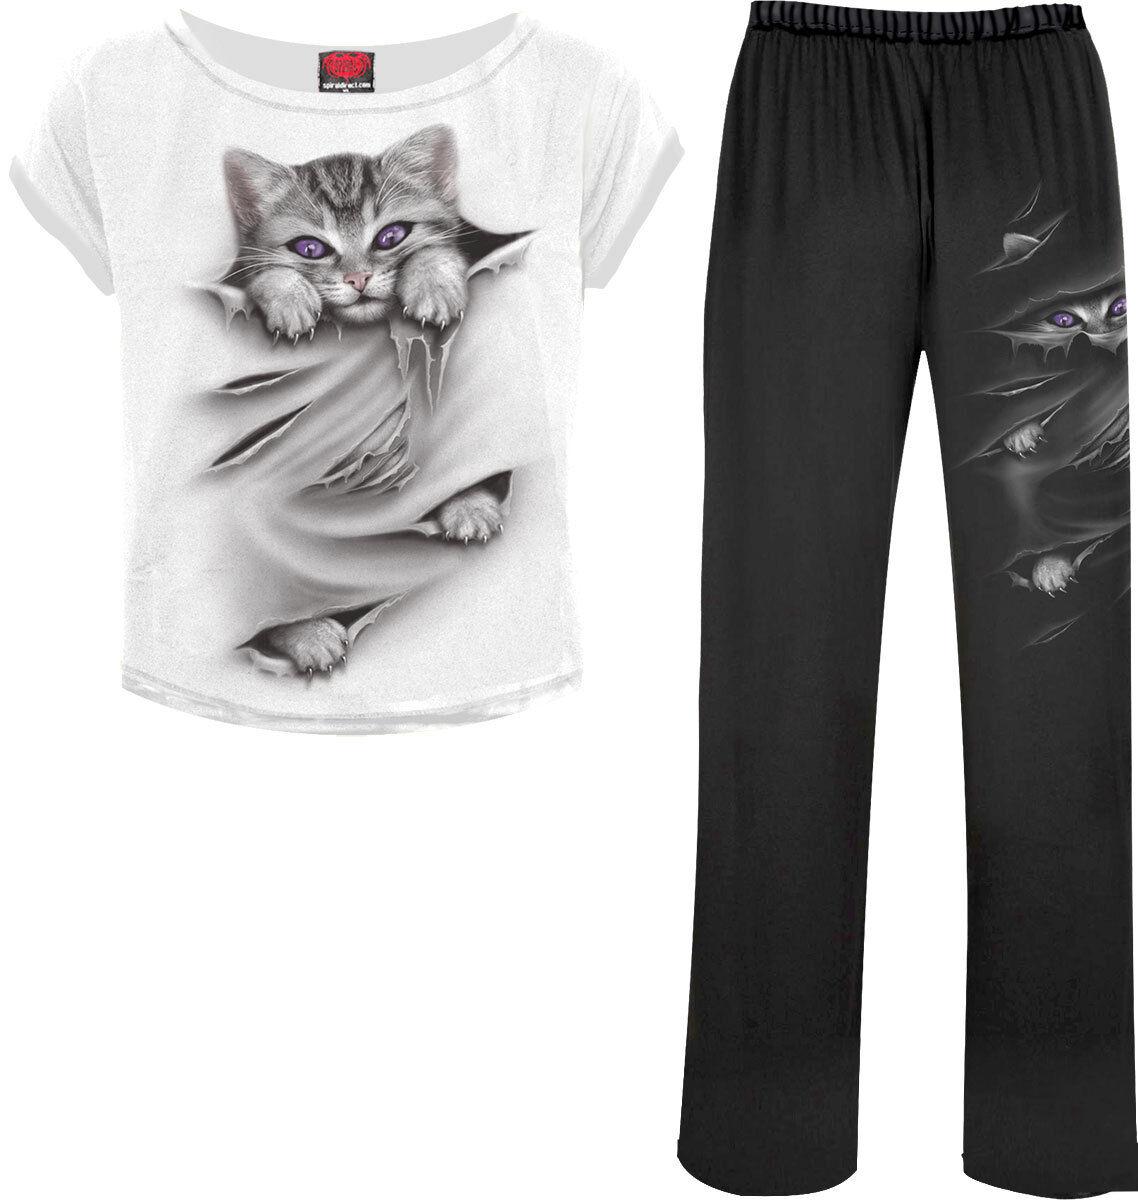 Spiral Direct BRIGHT EYES Women's 4 Piece Pajamas Set  Cat  Cute  Rips